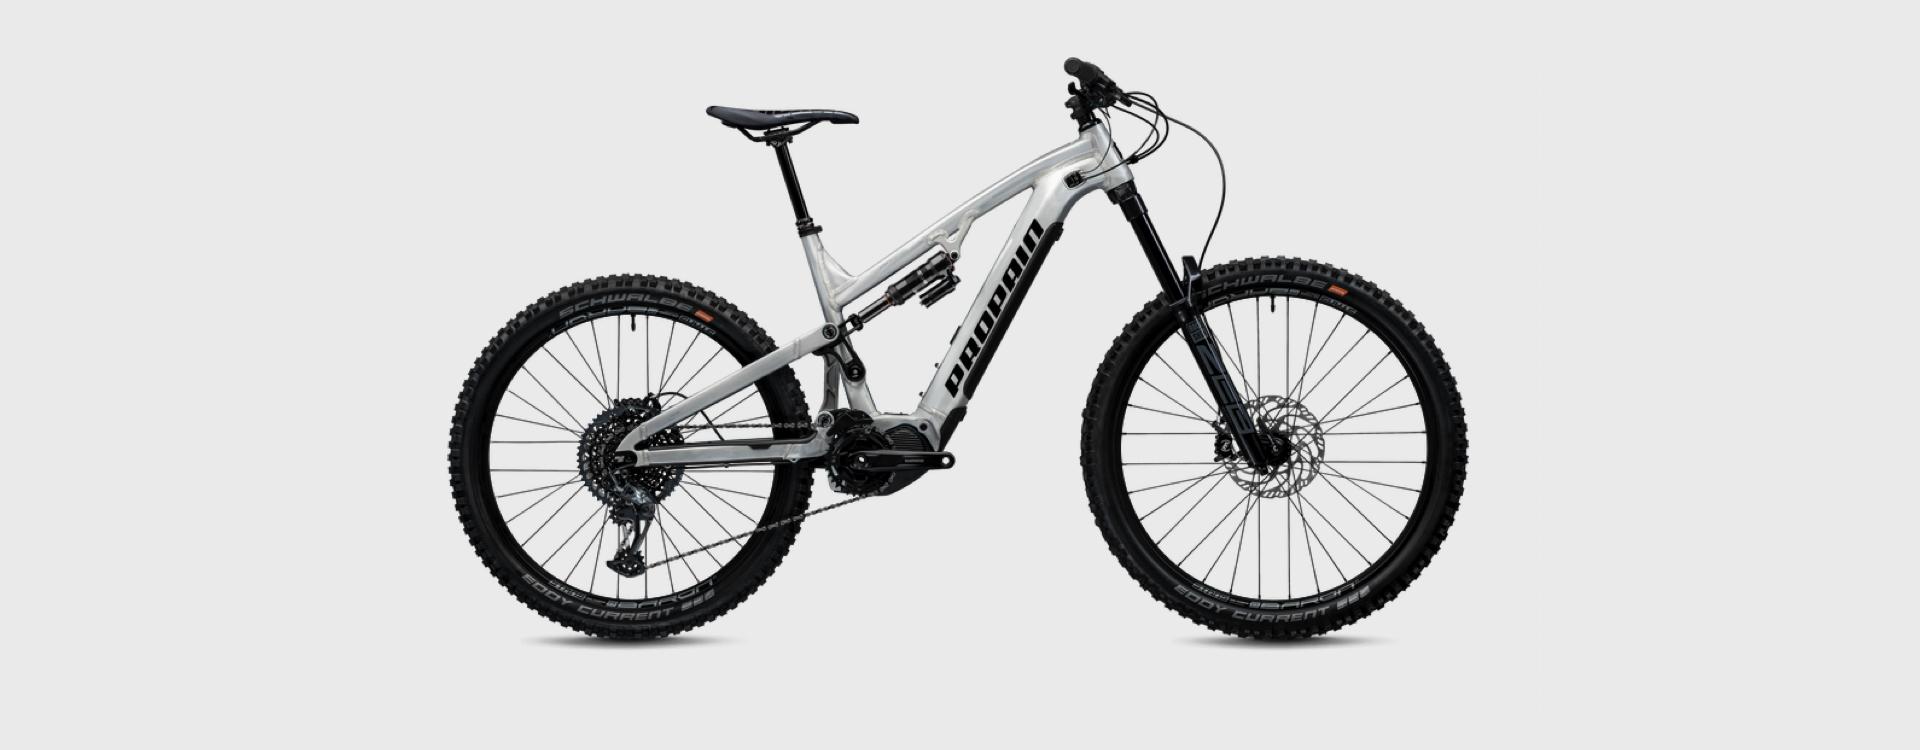 Bike Verleih Bad Salzdetfurth Propain Bikes Testcenter Niedersachsen Ekano 2 - AL - S - Mix - Raw - 1920x750